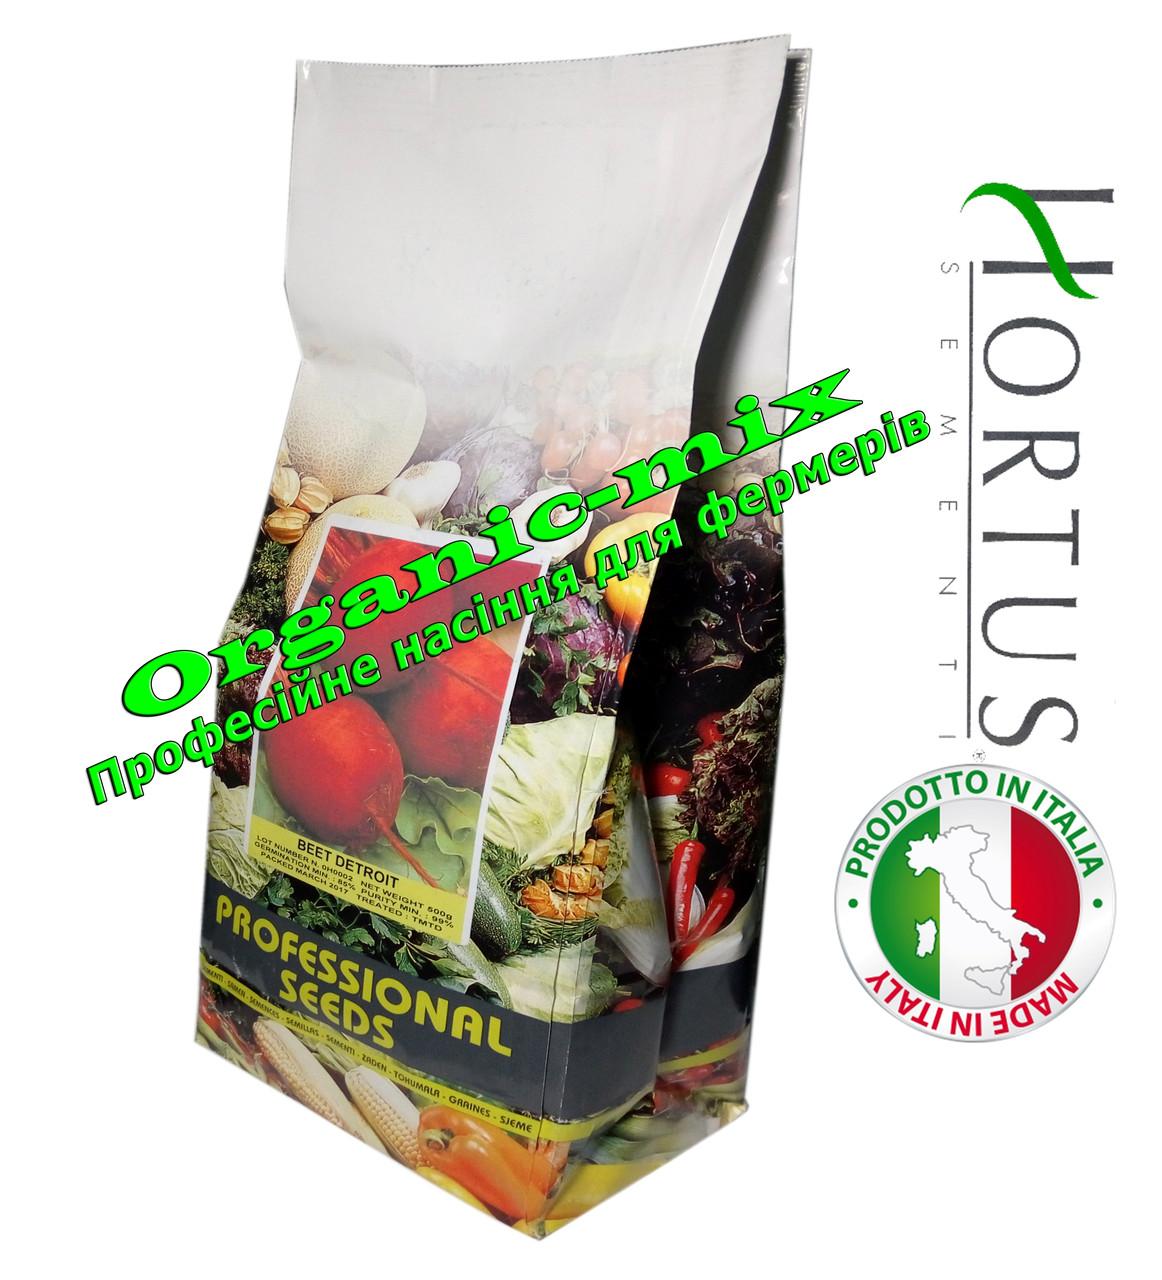 Семена, ДЕТРОЙТ 2 / DETROYT 2 - свекла ТМ Hortus Италия, пакет 500 грамм.